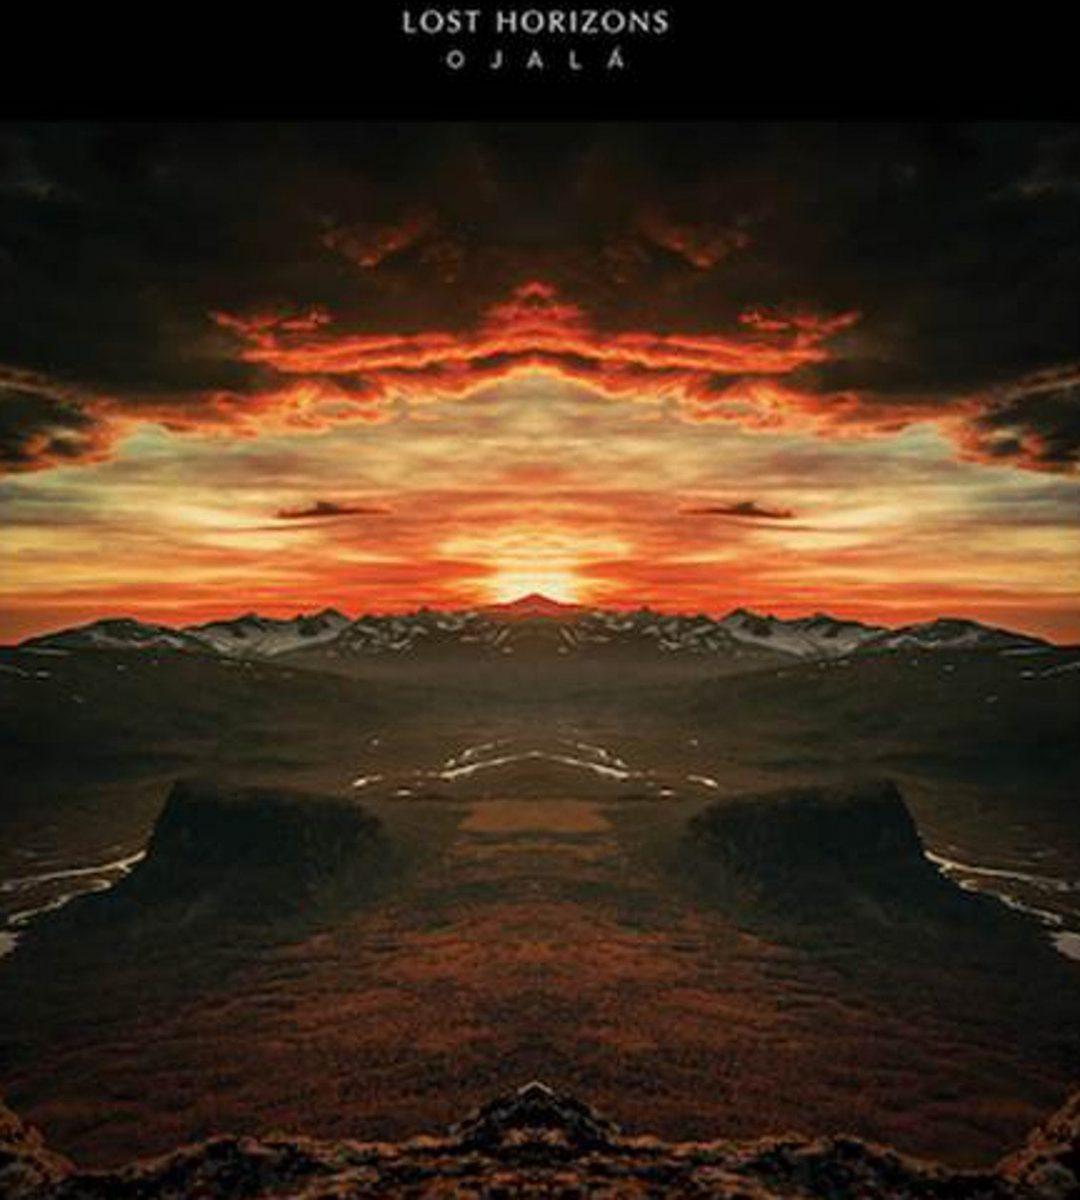 Simon Raymonde (Cocteau Twins, Bella Union label) presents debut album'Ojalá' by Lost Horizons